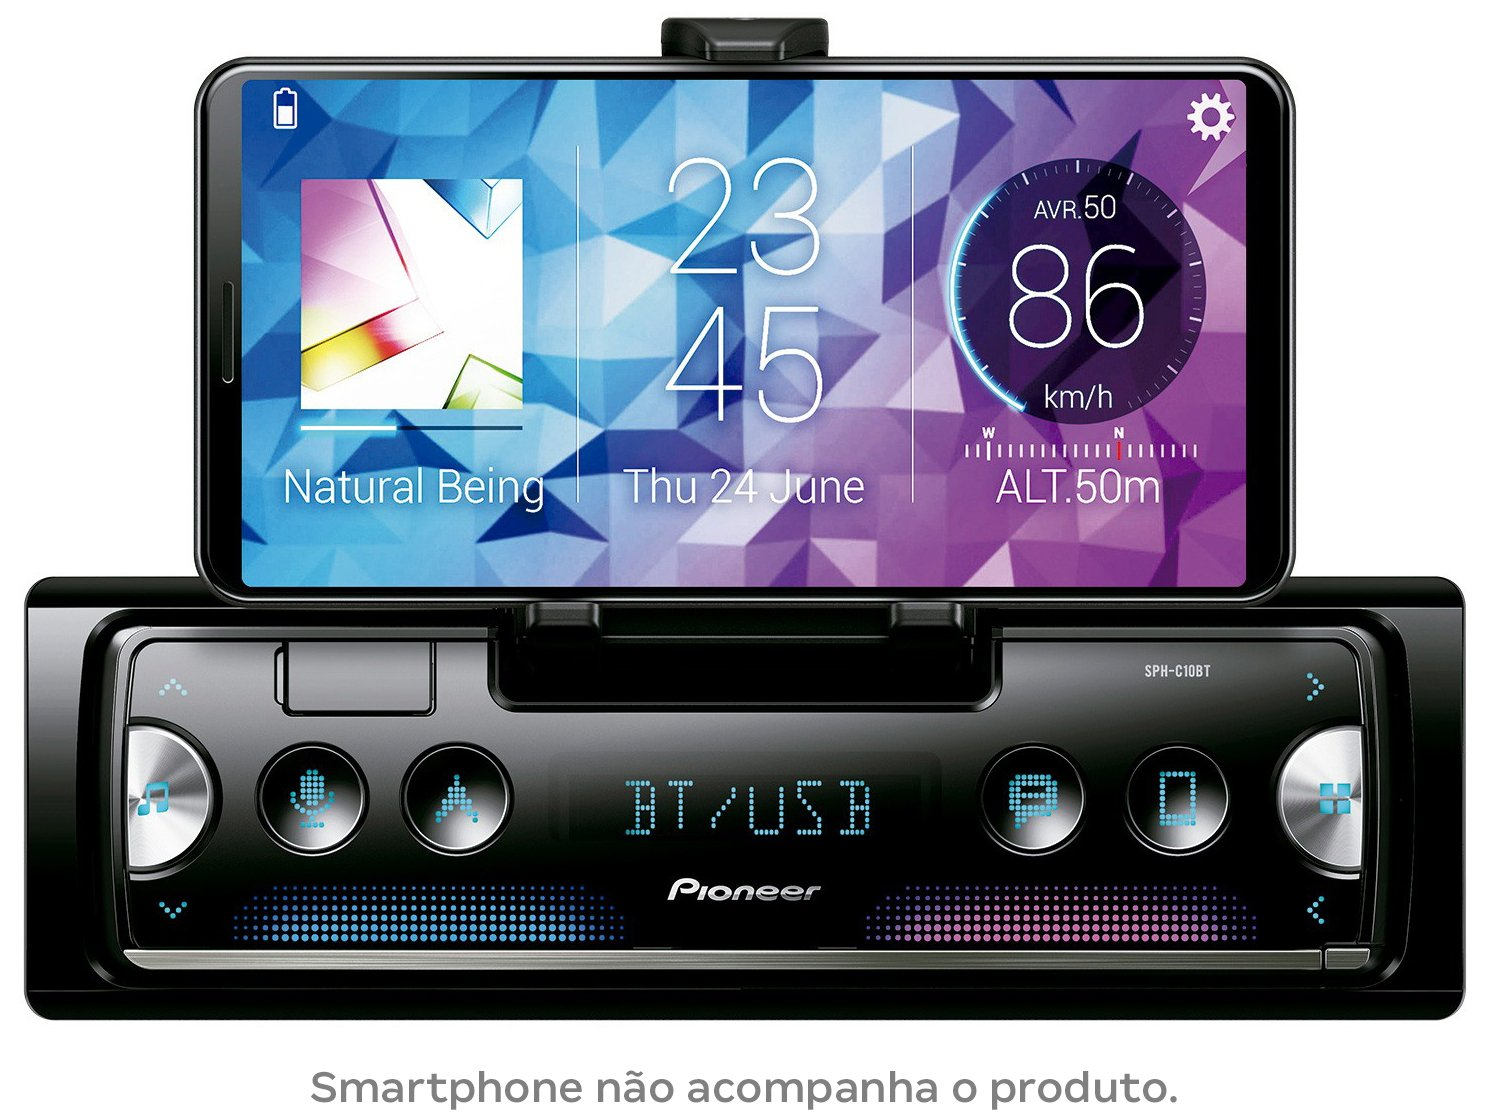 Som Automotivo Pioneer MP3 AM/FM Bluetooth - USB SPH-C10BT - 4